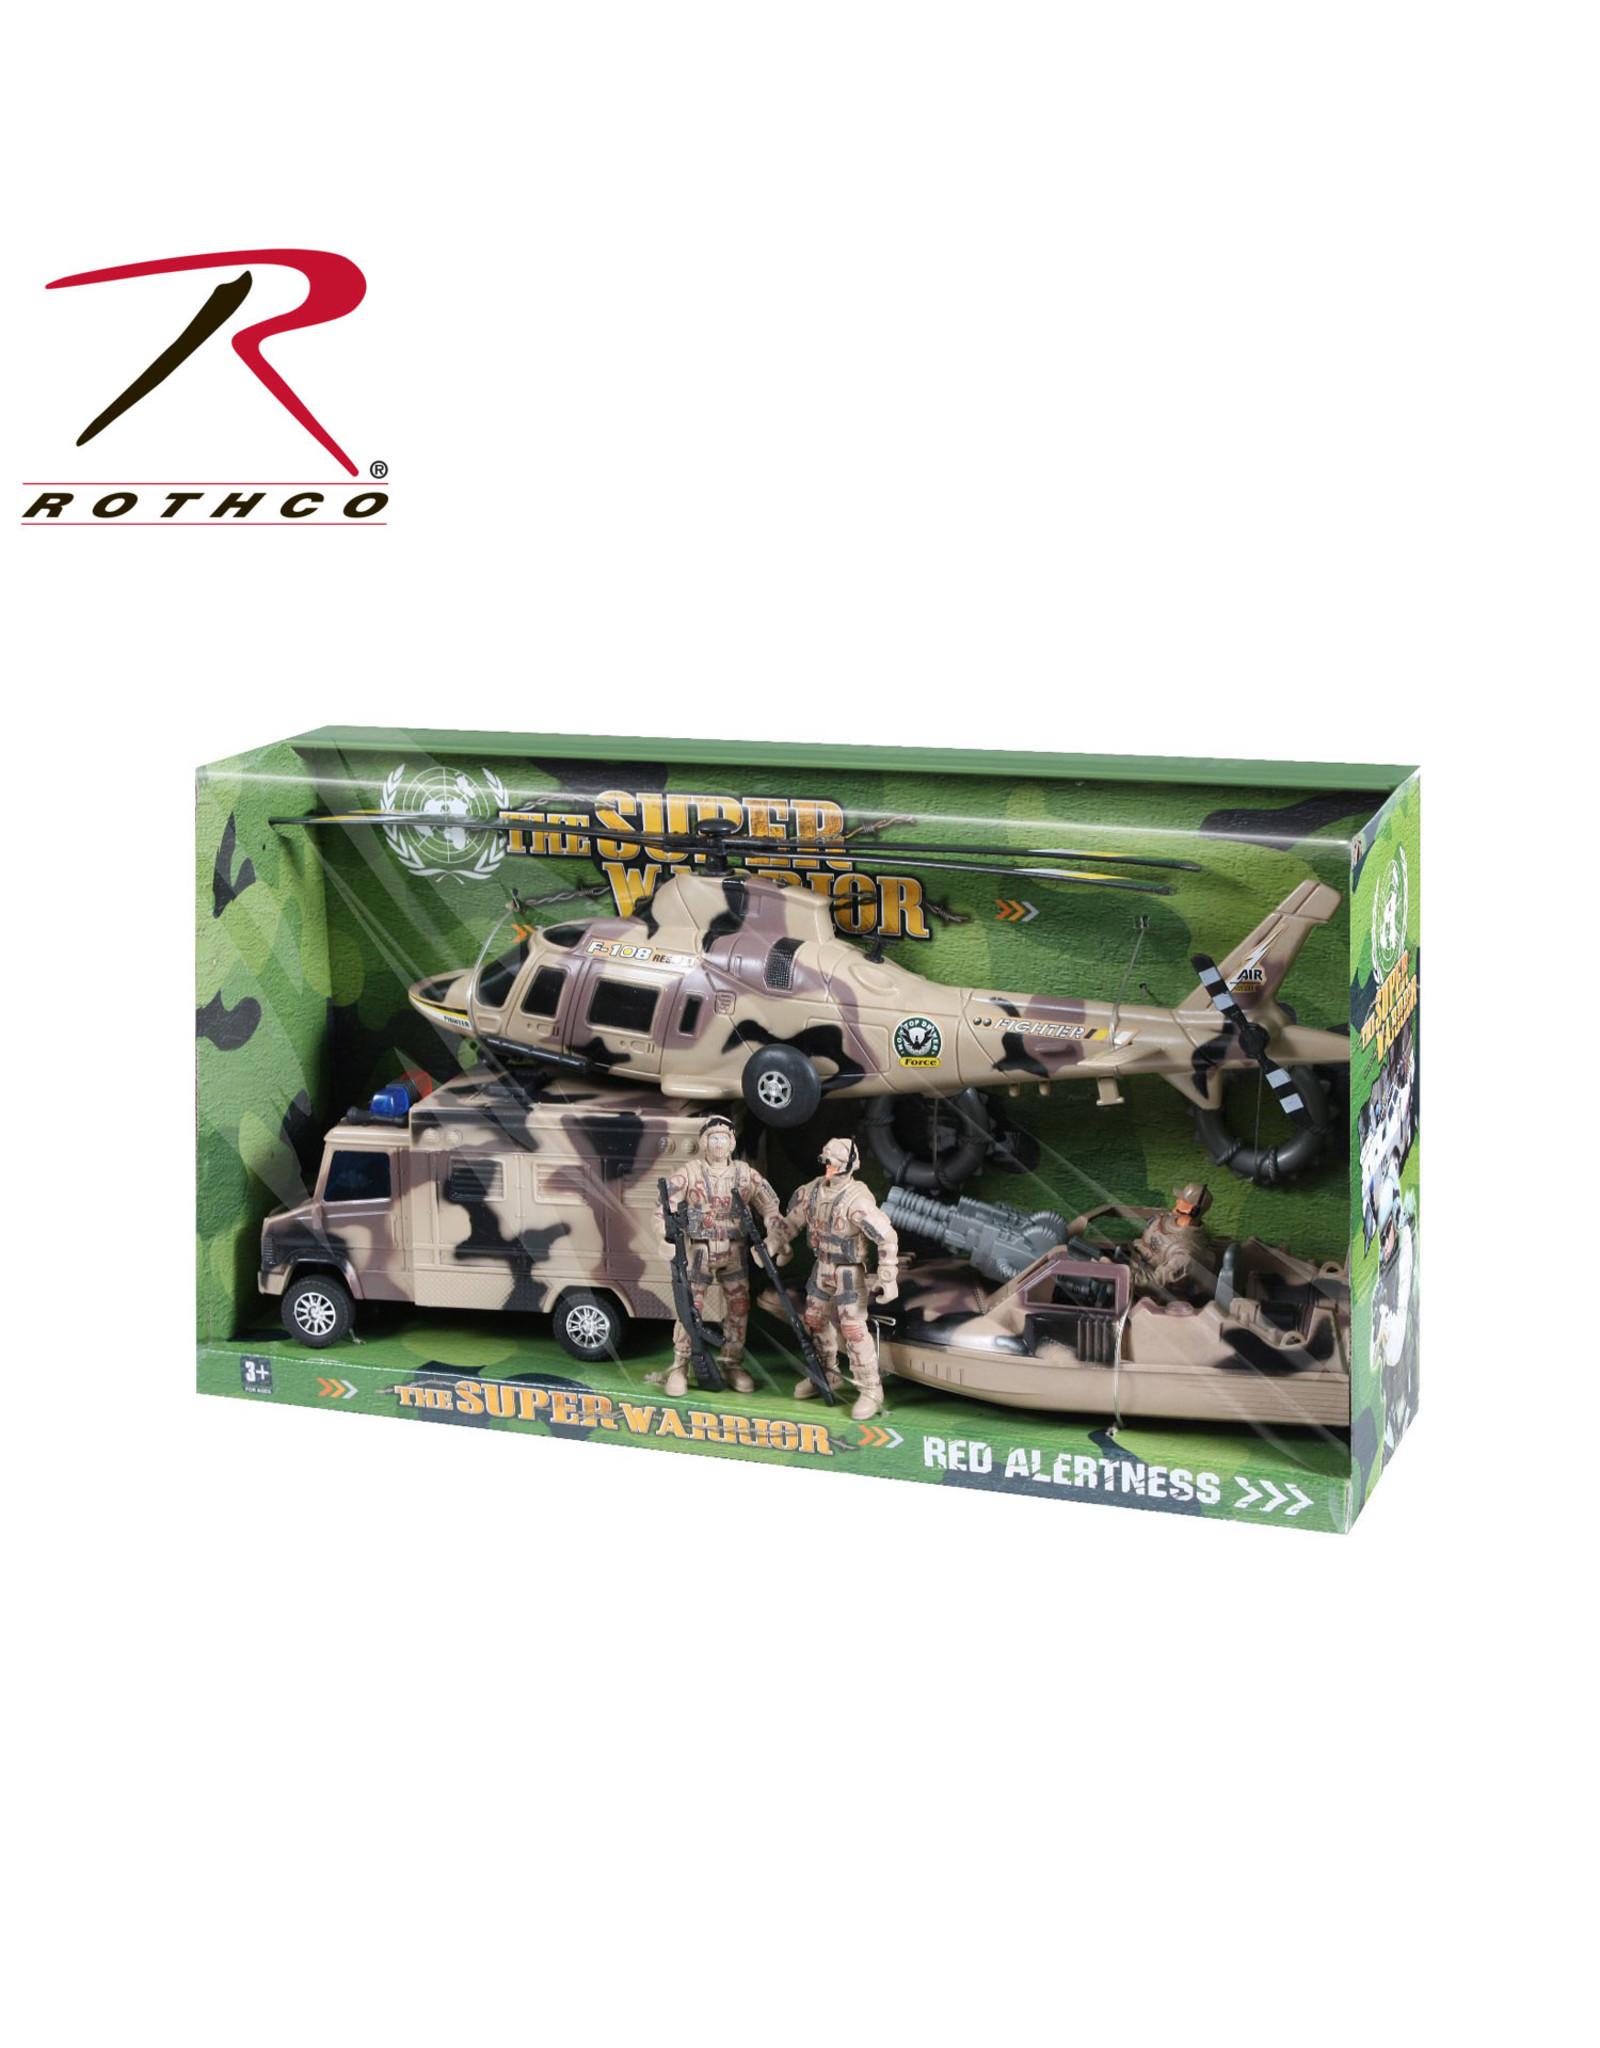 Super Warrior Playset Toys